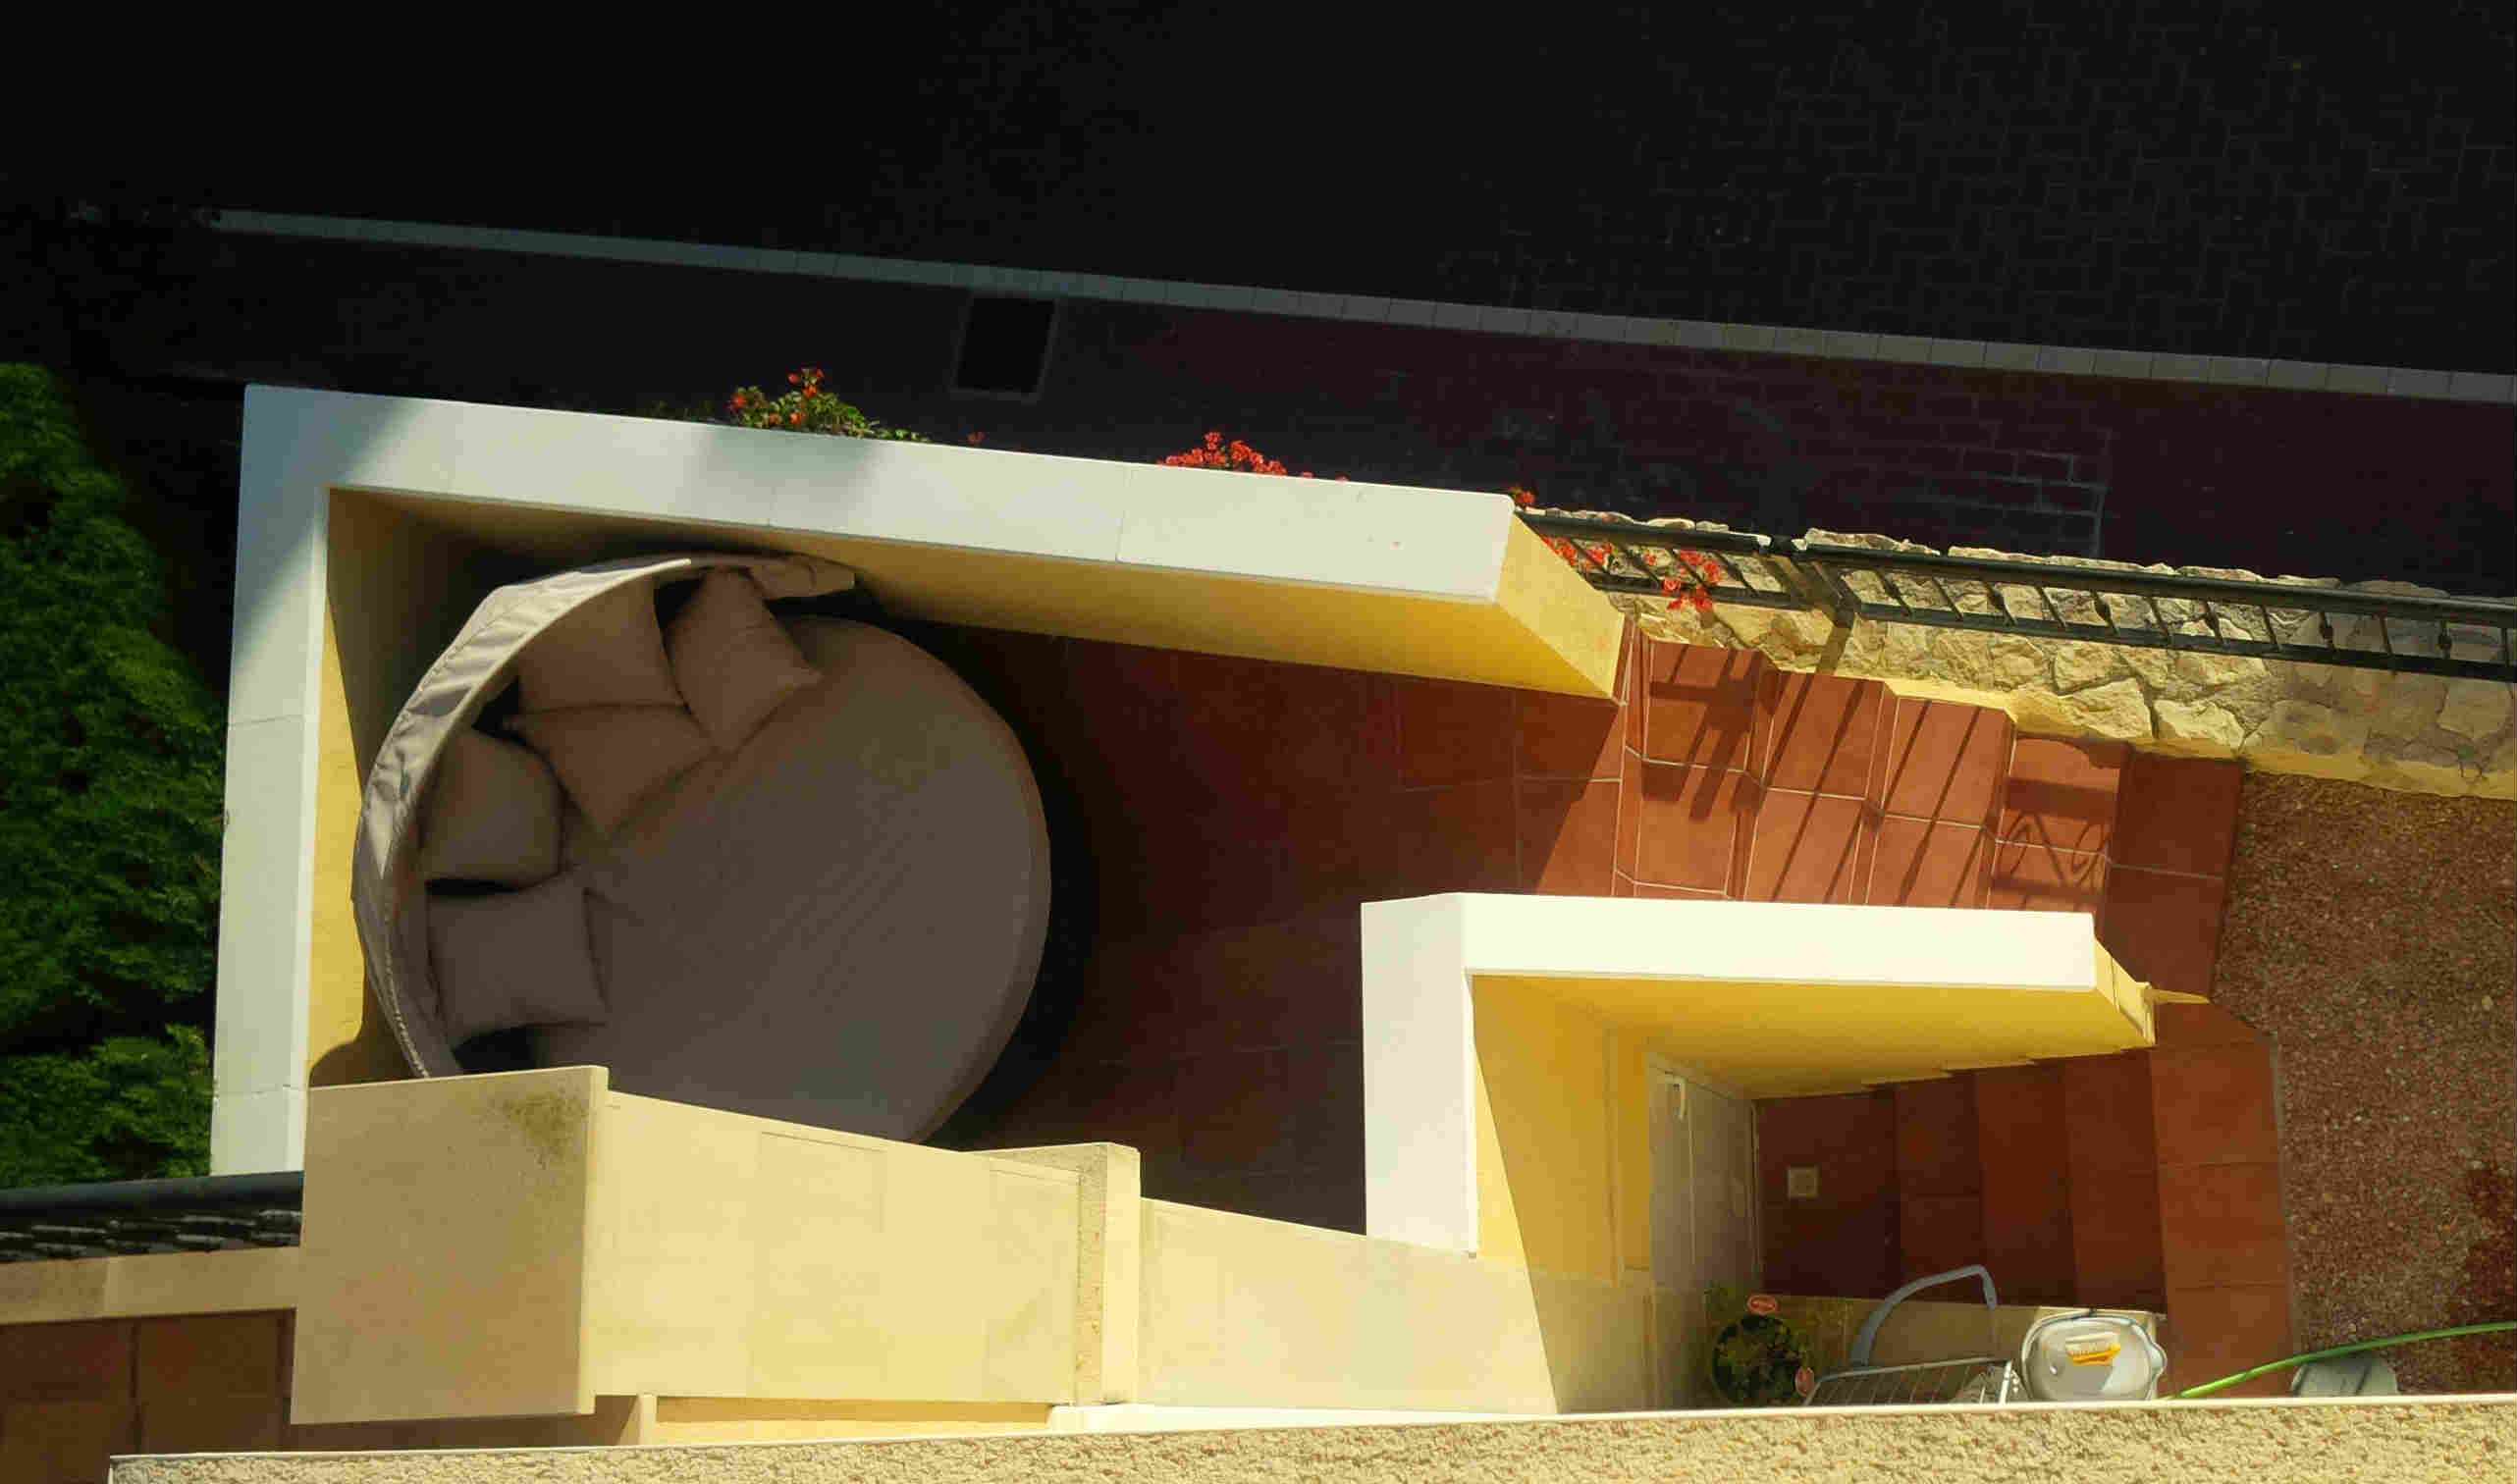 Ansell Construction & Maintenance SL